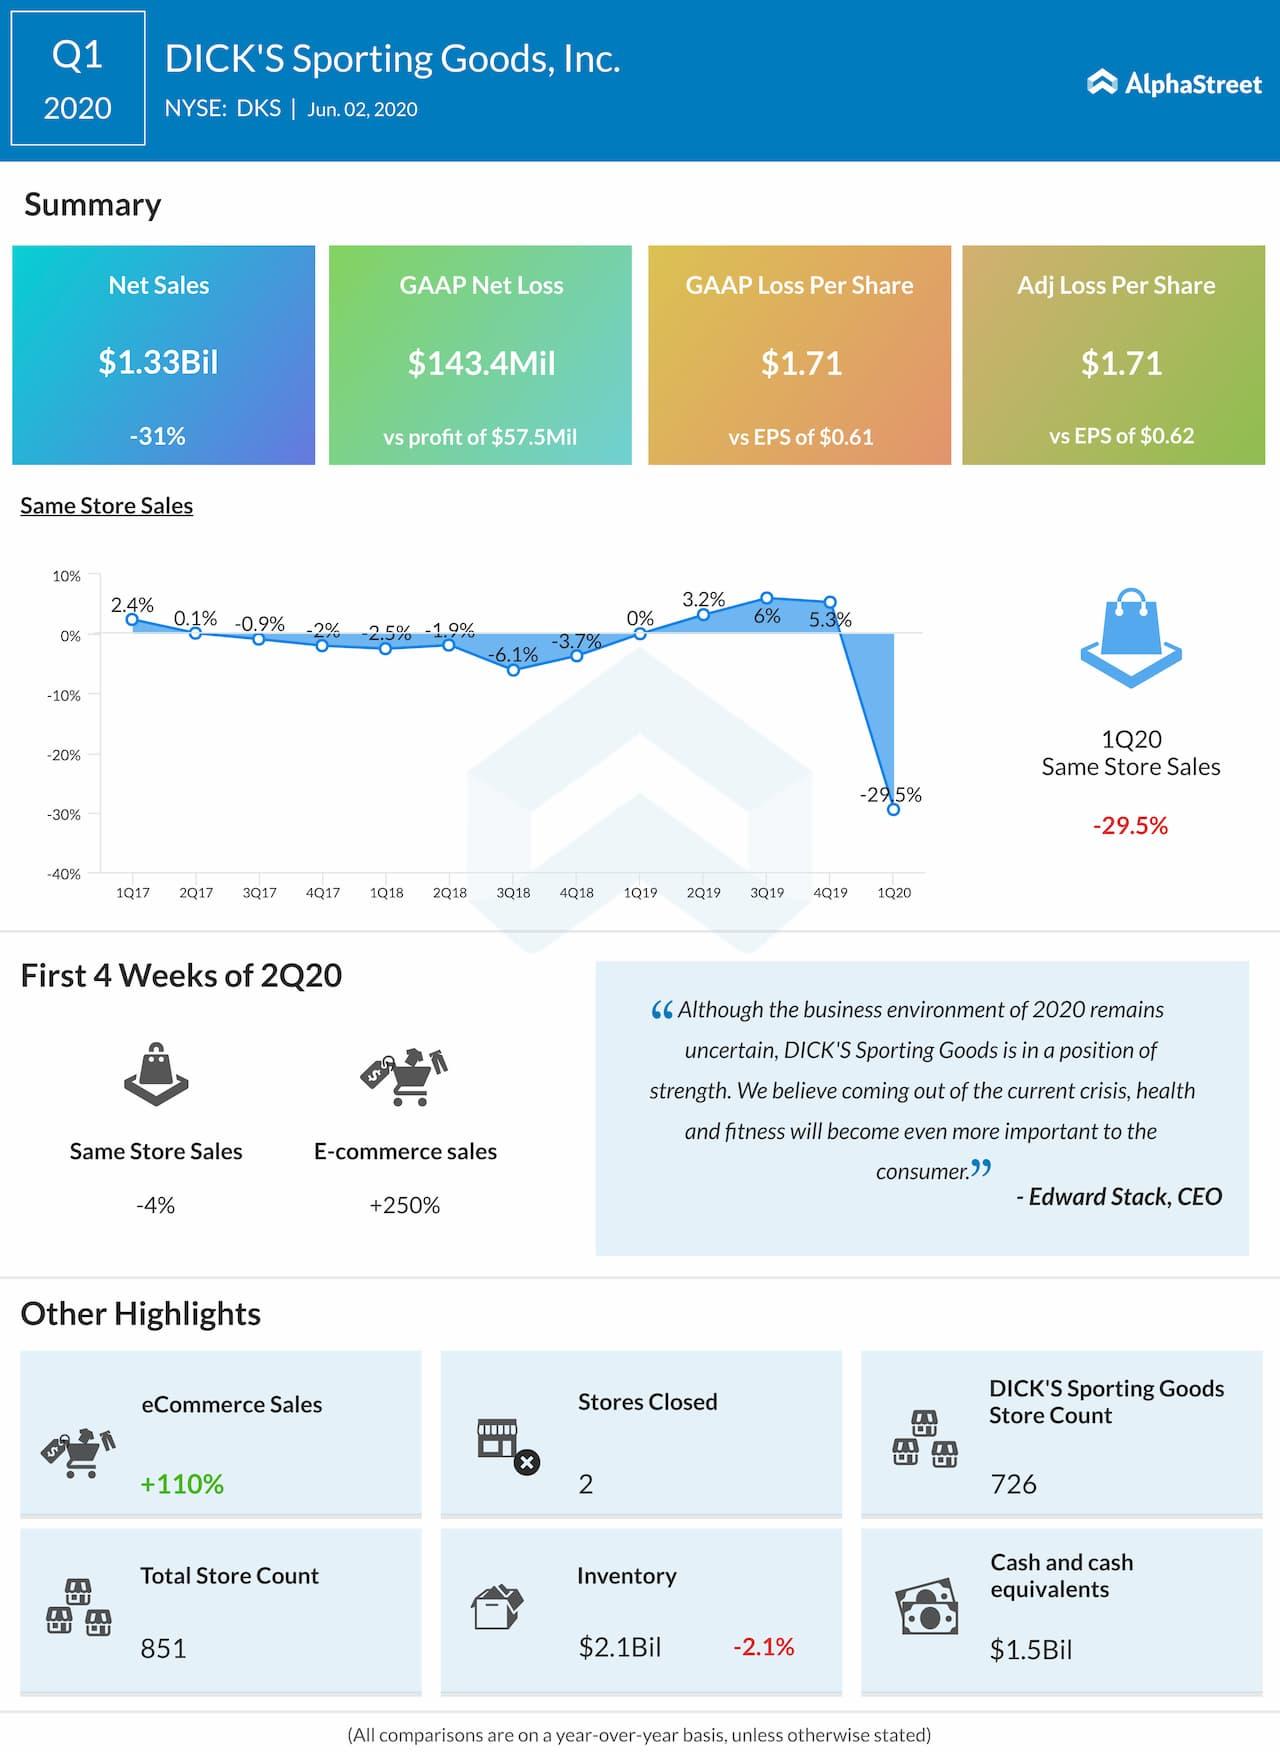 DICK'S Sporting Goods (DKS) Q1 2020 earnings review